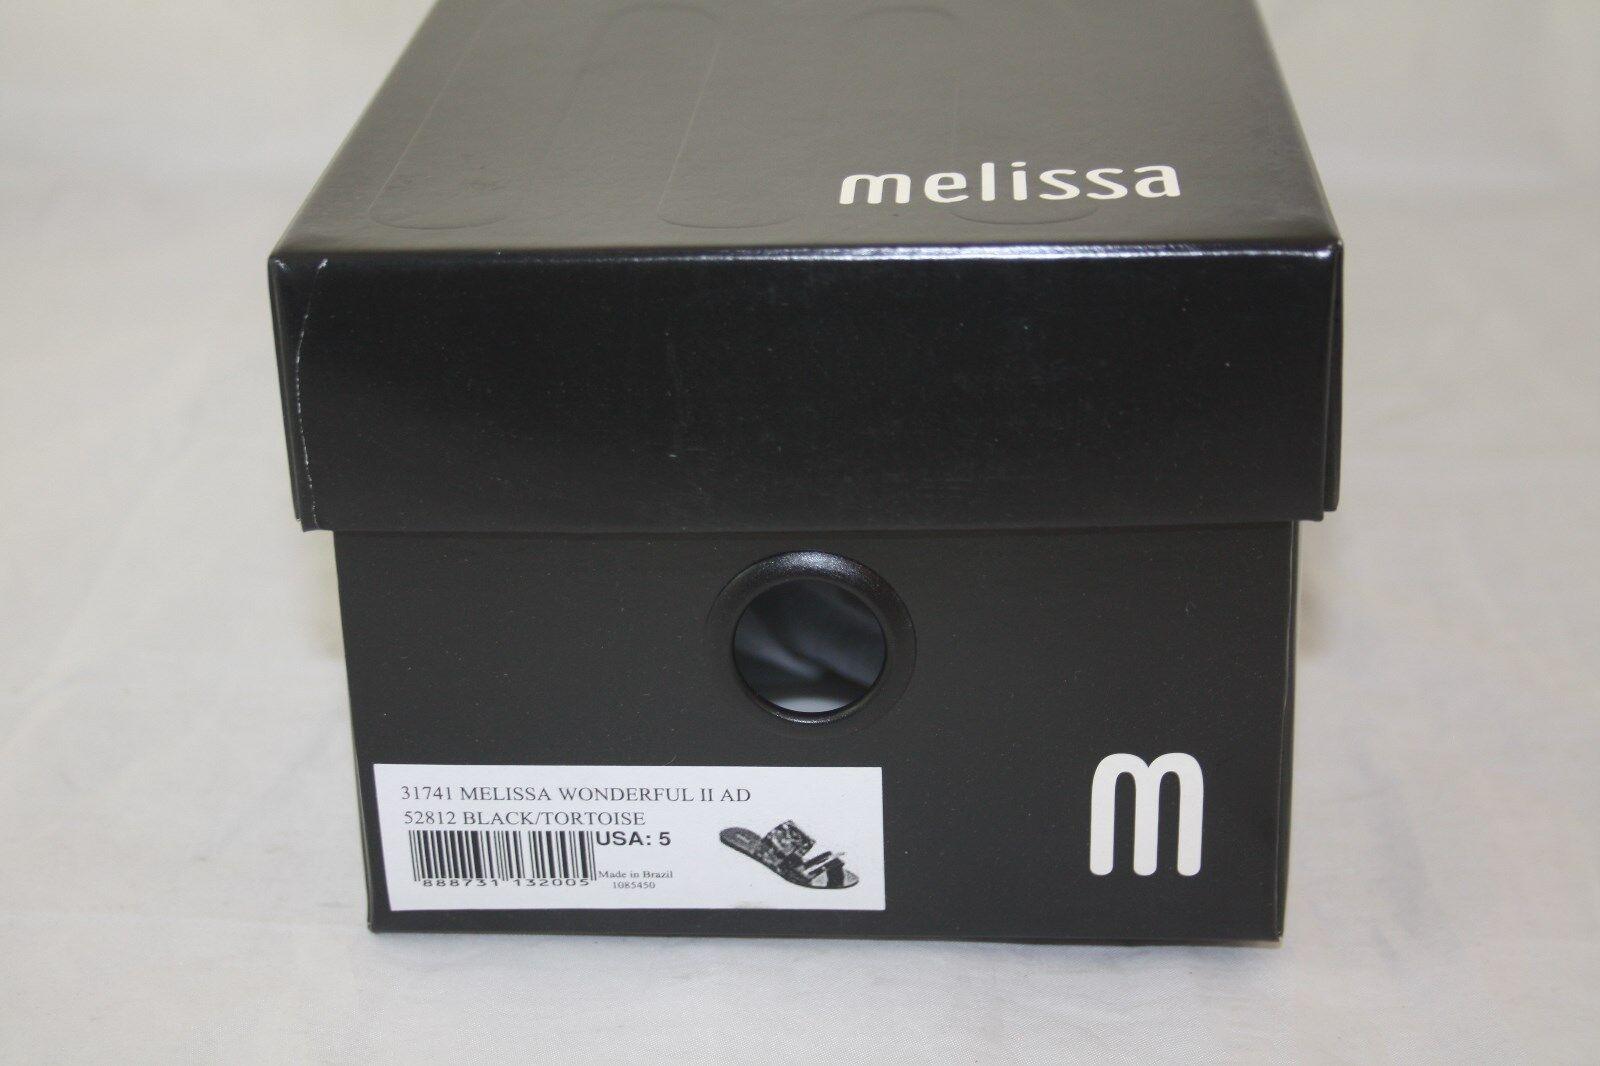 Nuevo WMNS sueco 31741 Melissa maravilloso II II II AD 52812 Negro Tortuga diapositiva be6192